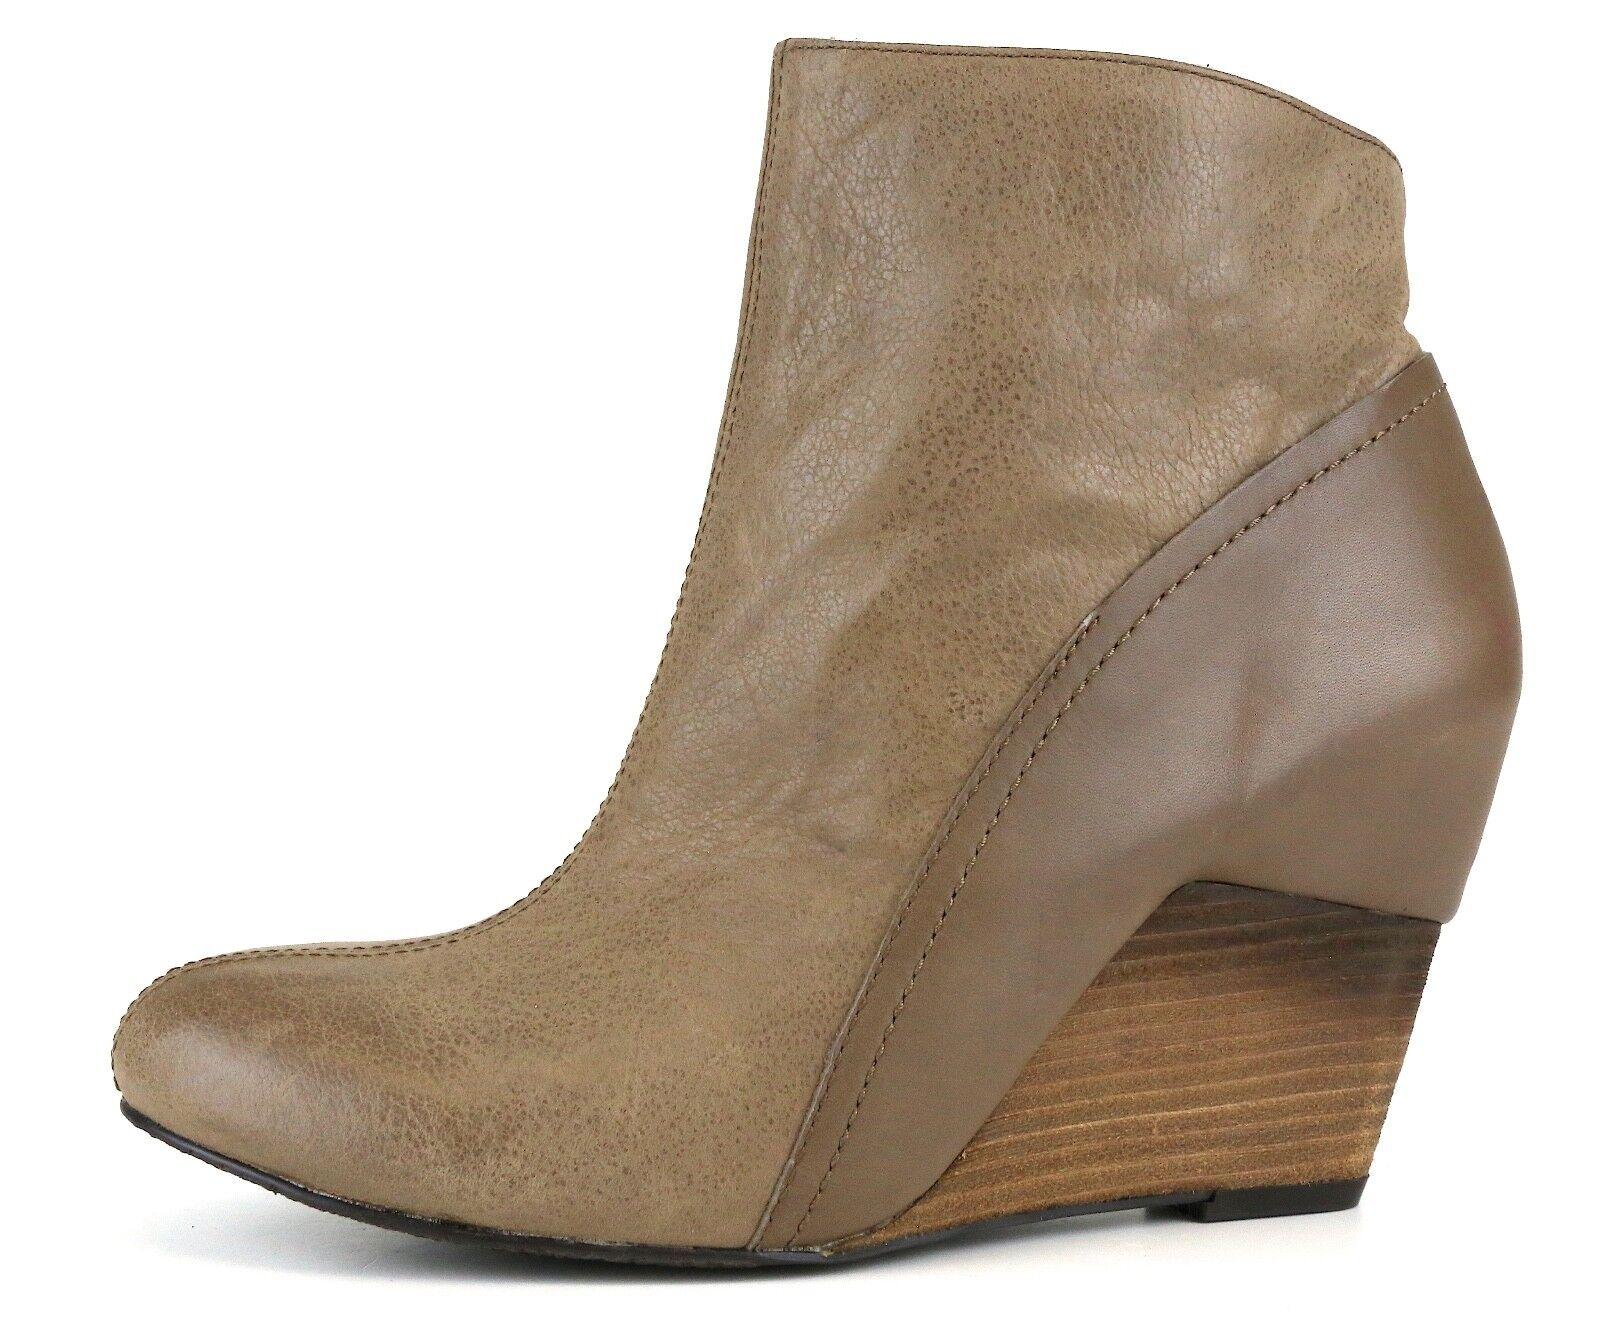 Vince Camuto Hillari Pelle Boot Taupe Donna Sz 10 M 5446 *